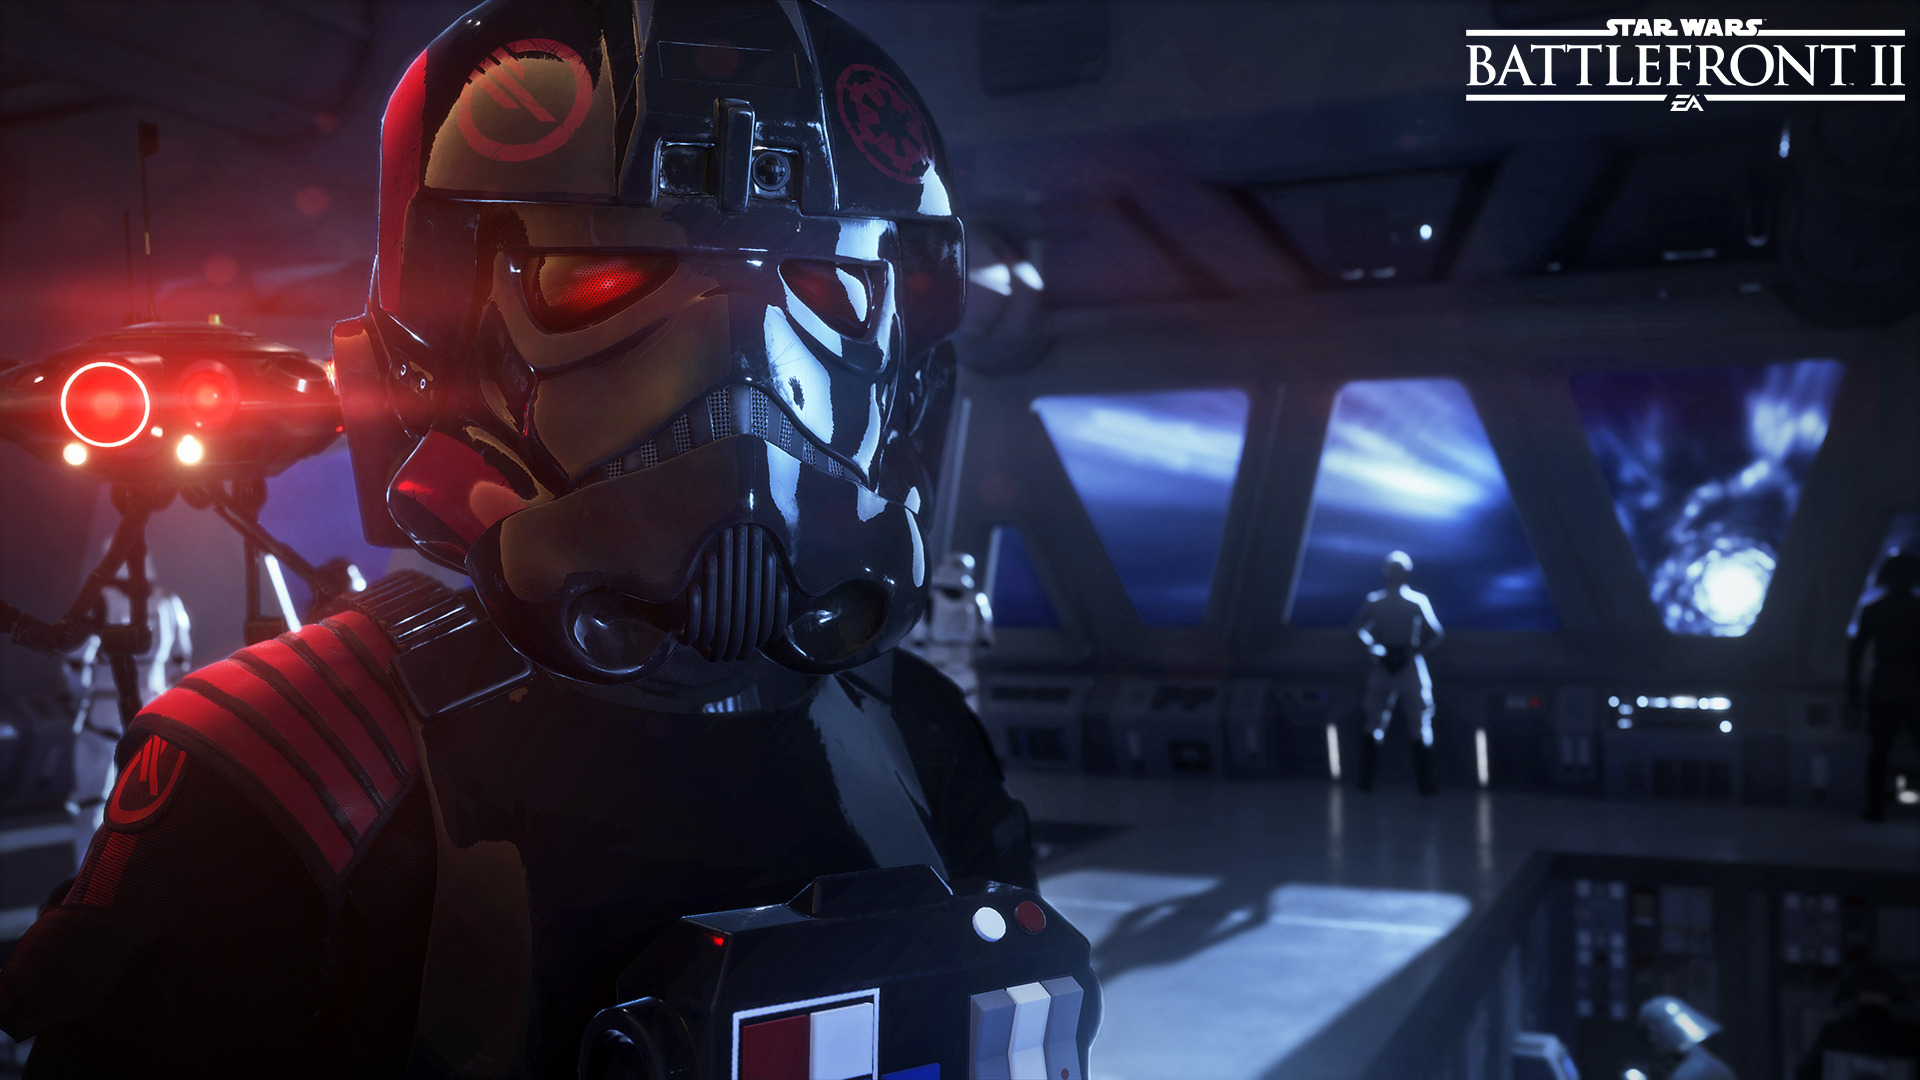 Removidas microtransacções de Star Wars Battlefront II